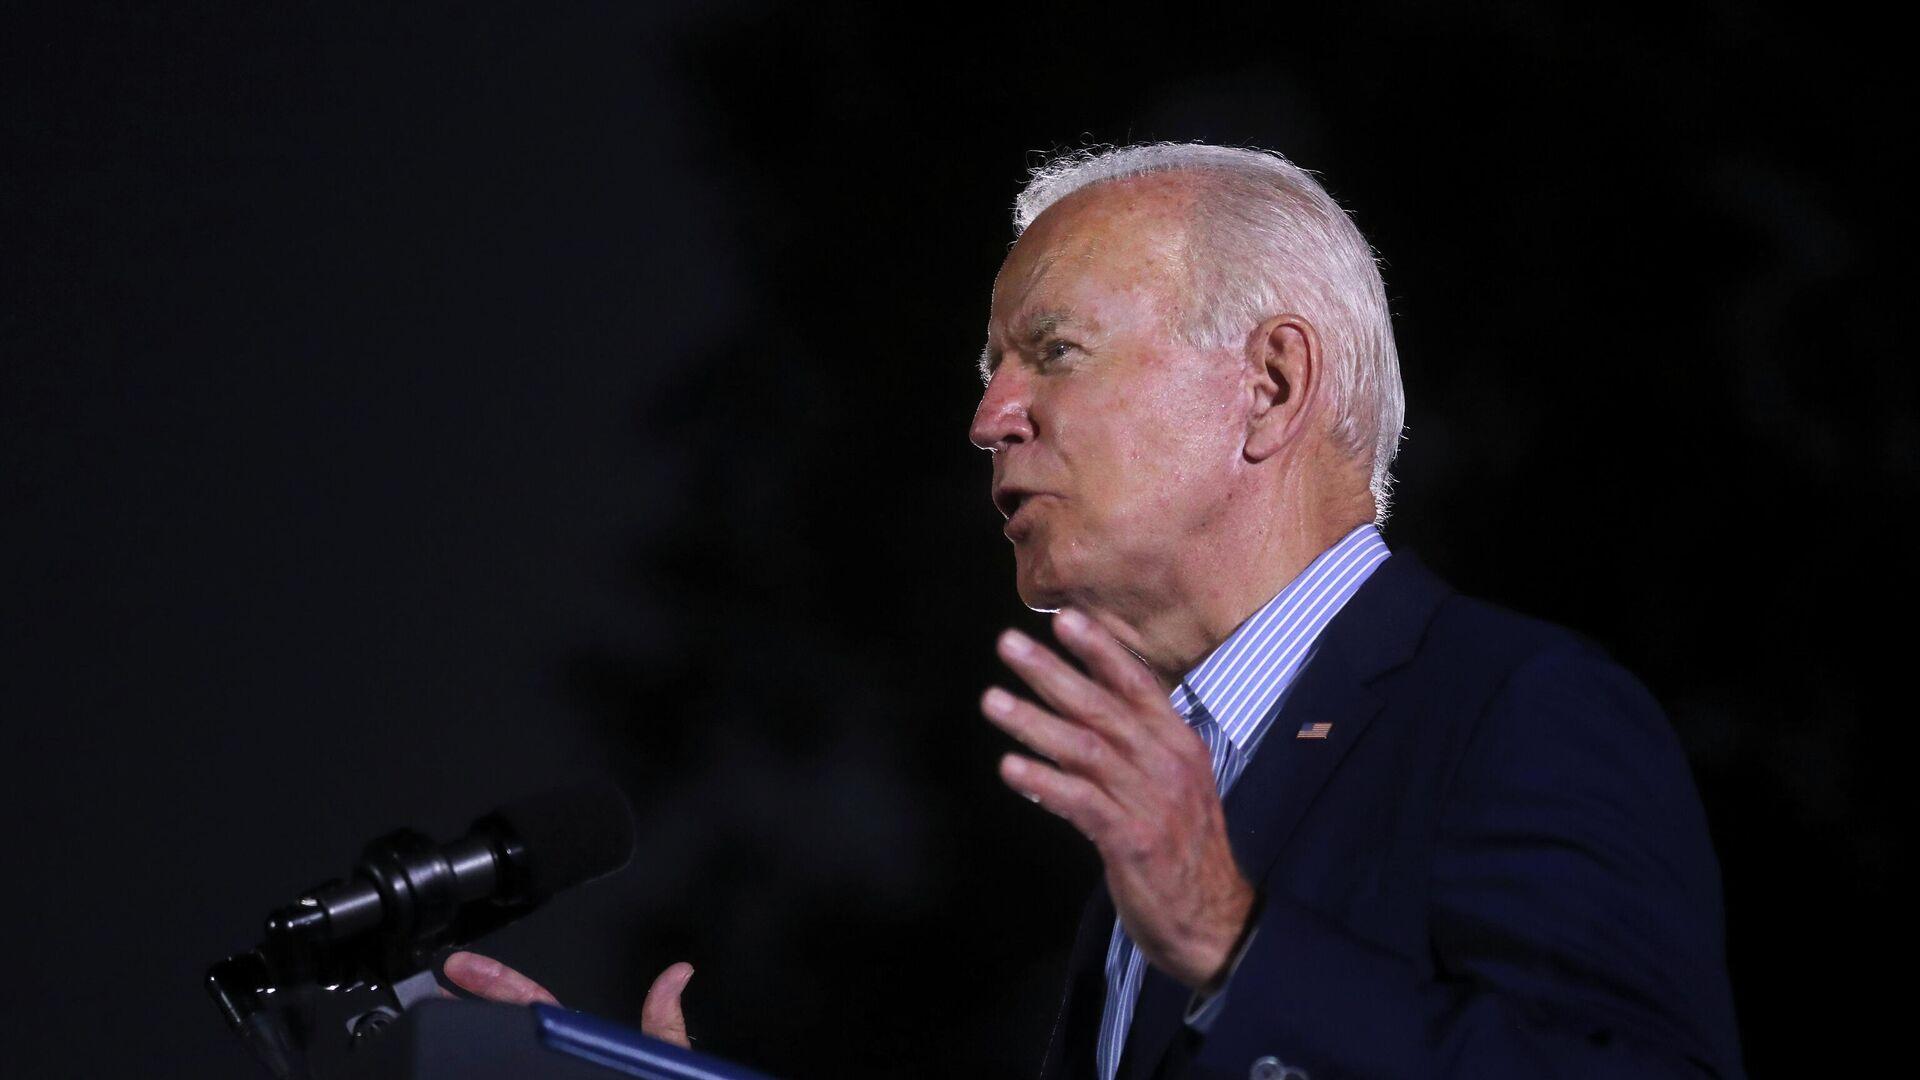 Joe Biden, presidente de EEUU - Sputnik Mundo, 1920, 14.09.2021